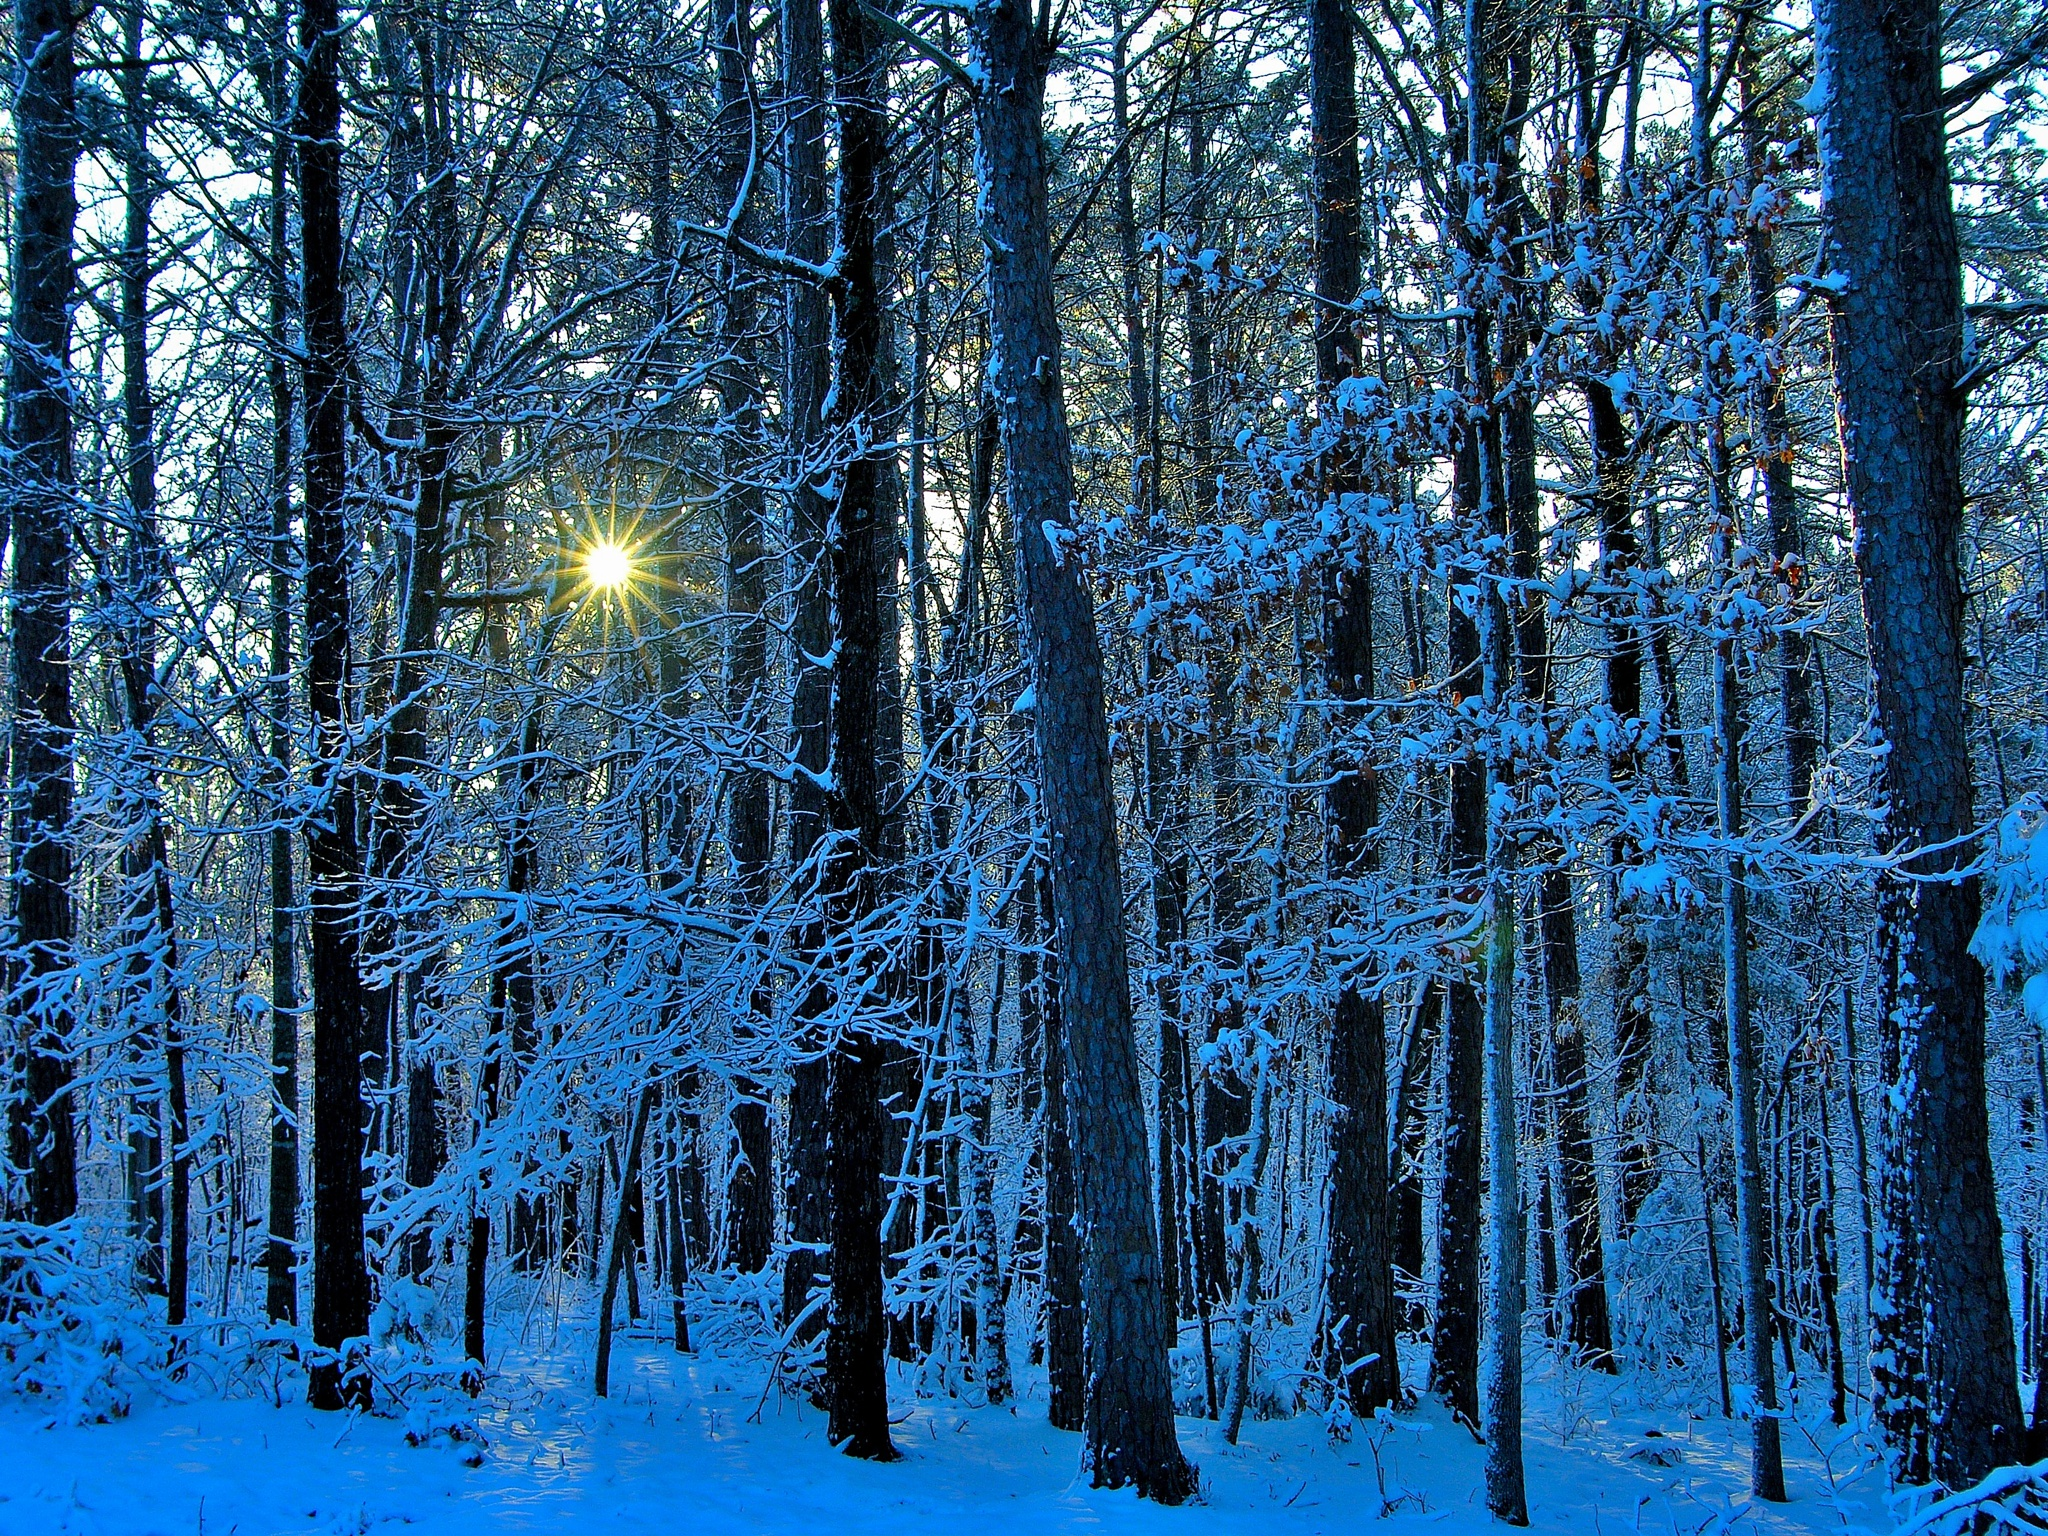 Snow 29~Winter Sun Star 2 by Lawrence Scott Hess